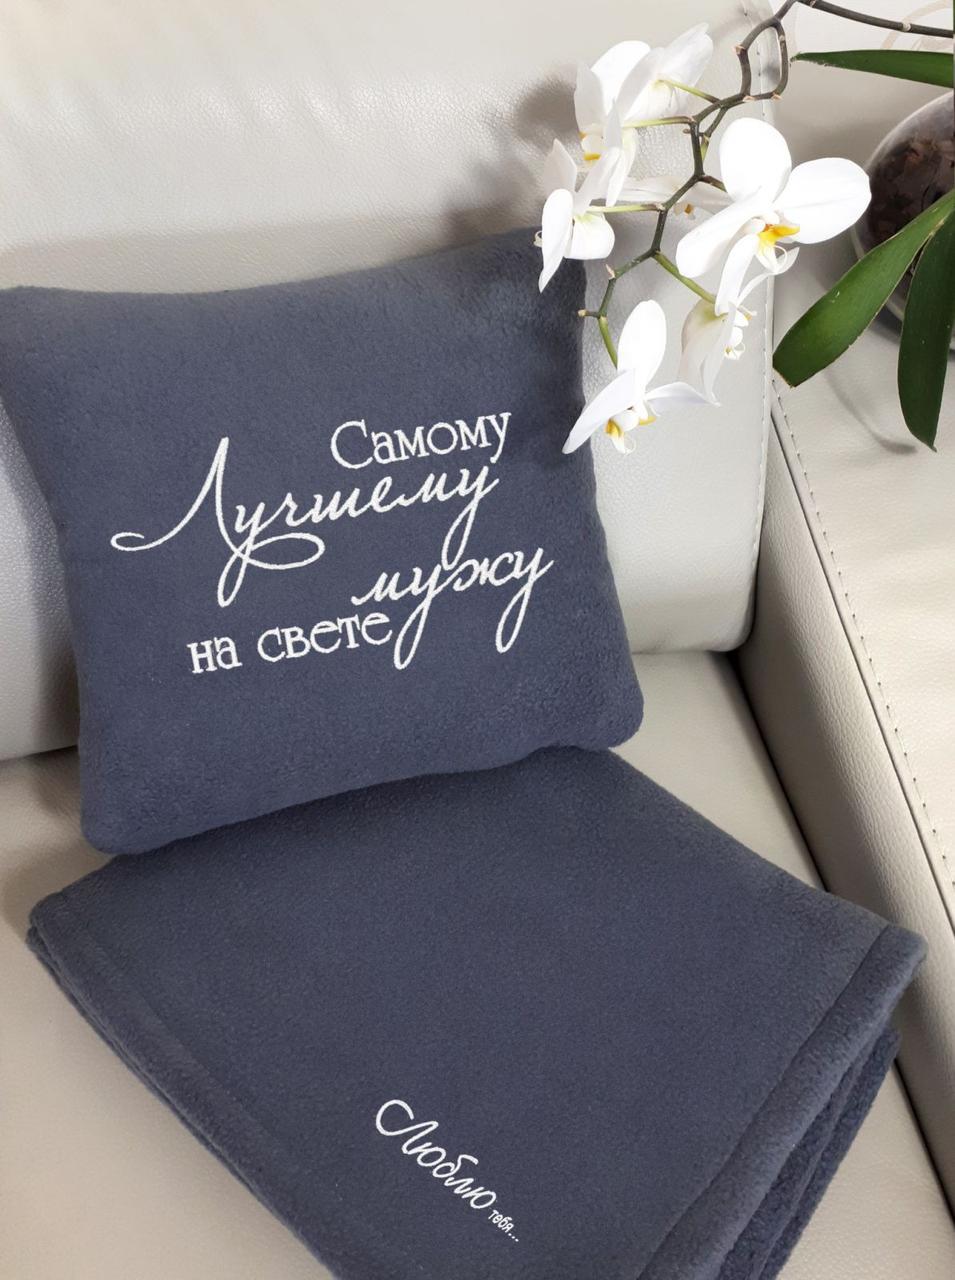 "Набор: подушка + плед Slivki ""Самому лучшему мужу на свете!"" 01  цвет серый"